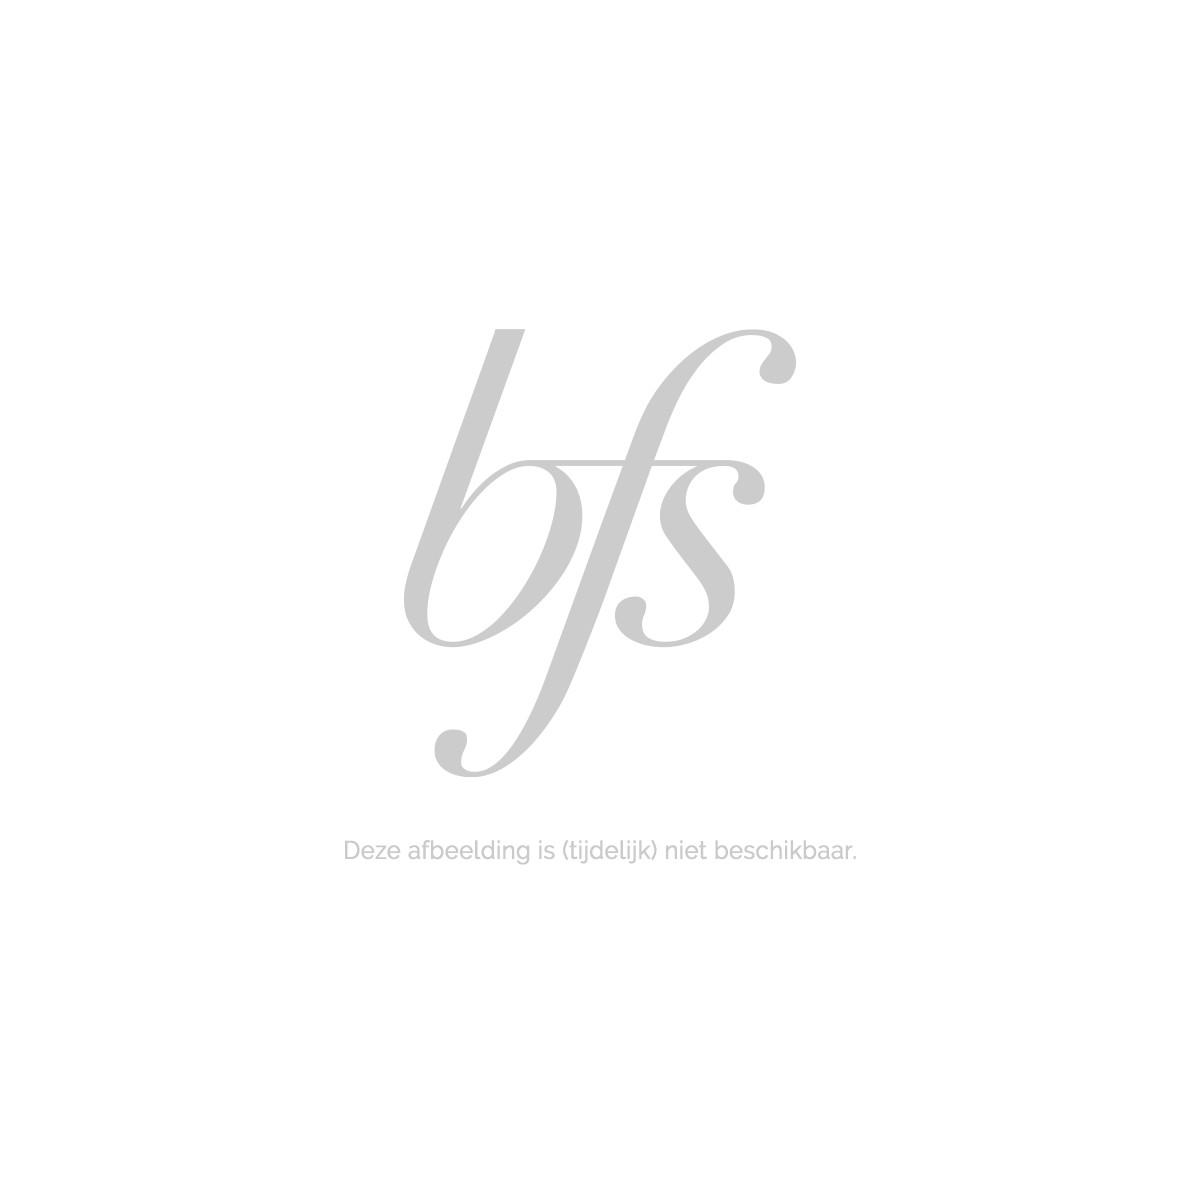 Afbeelding van Beautyblender Micro Mini Sponsjes Make up